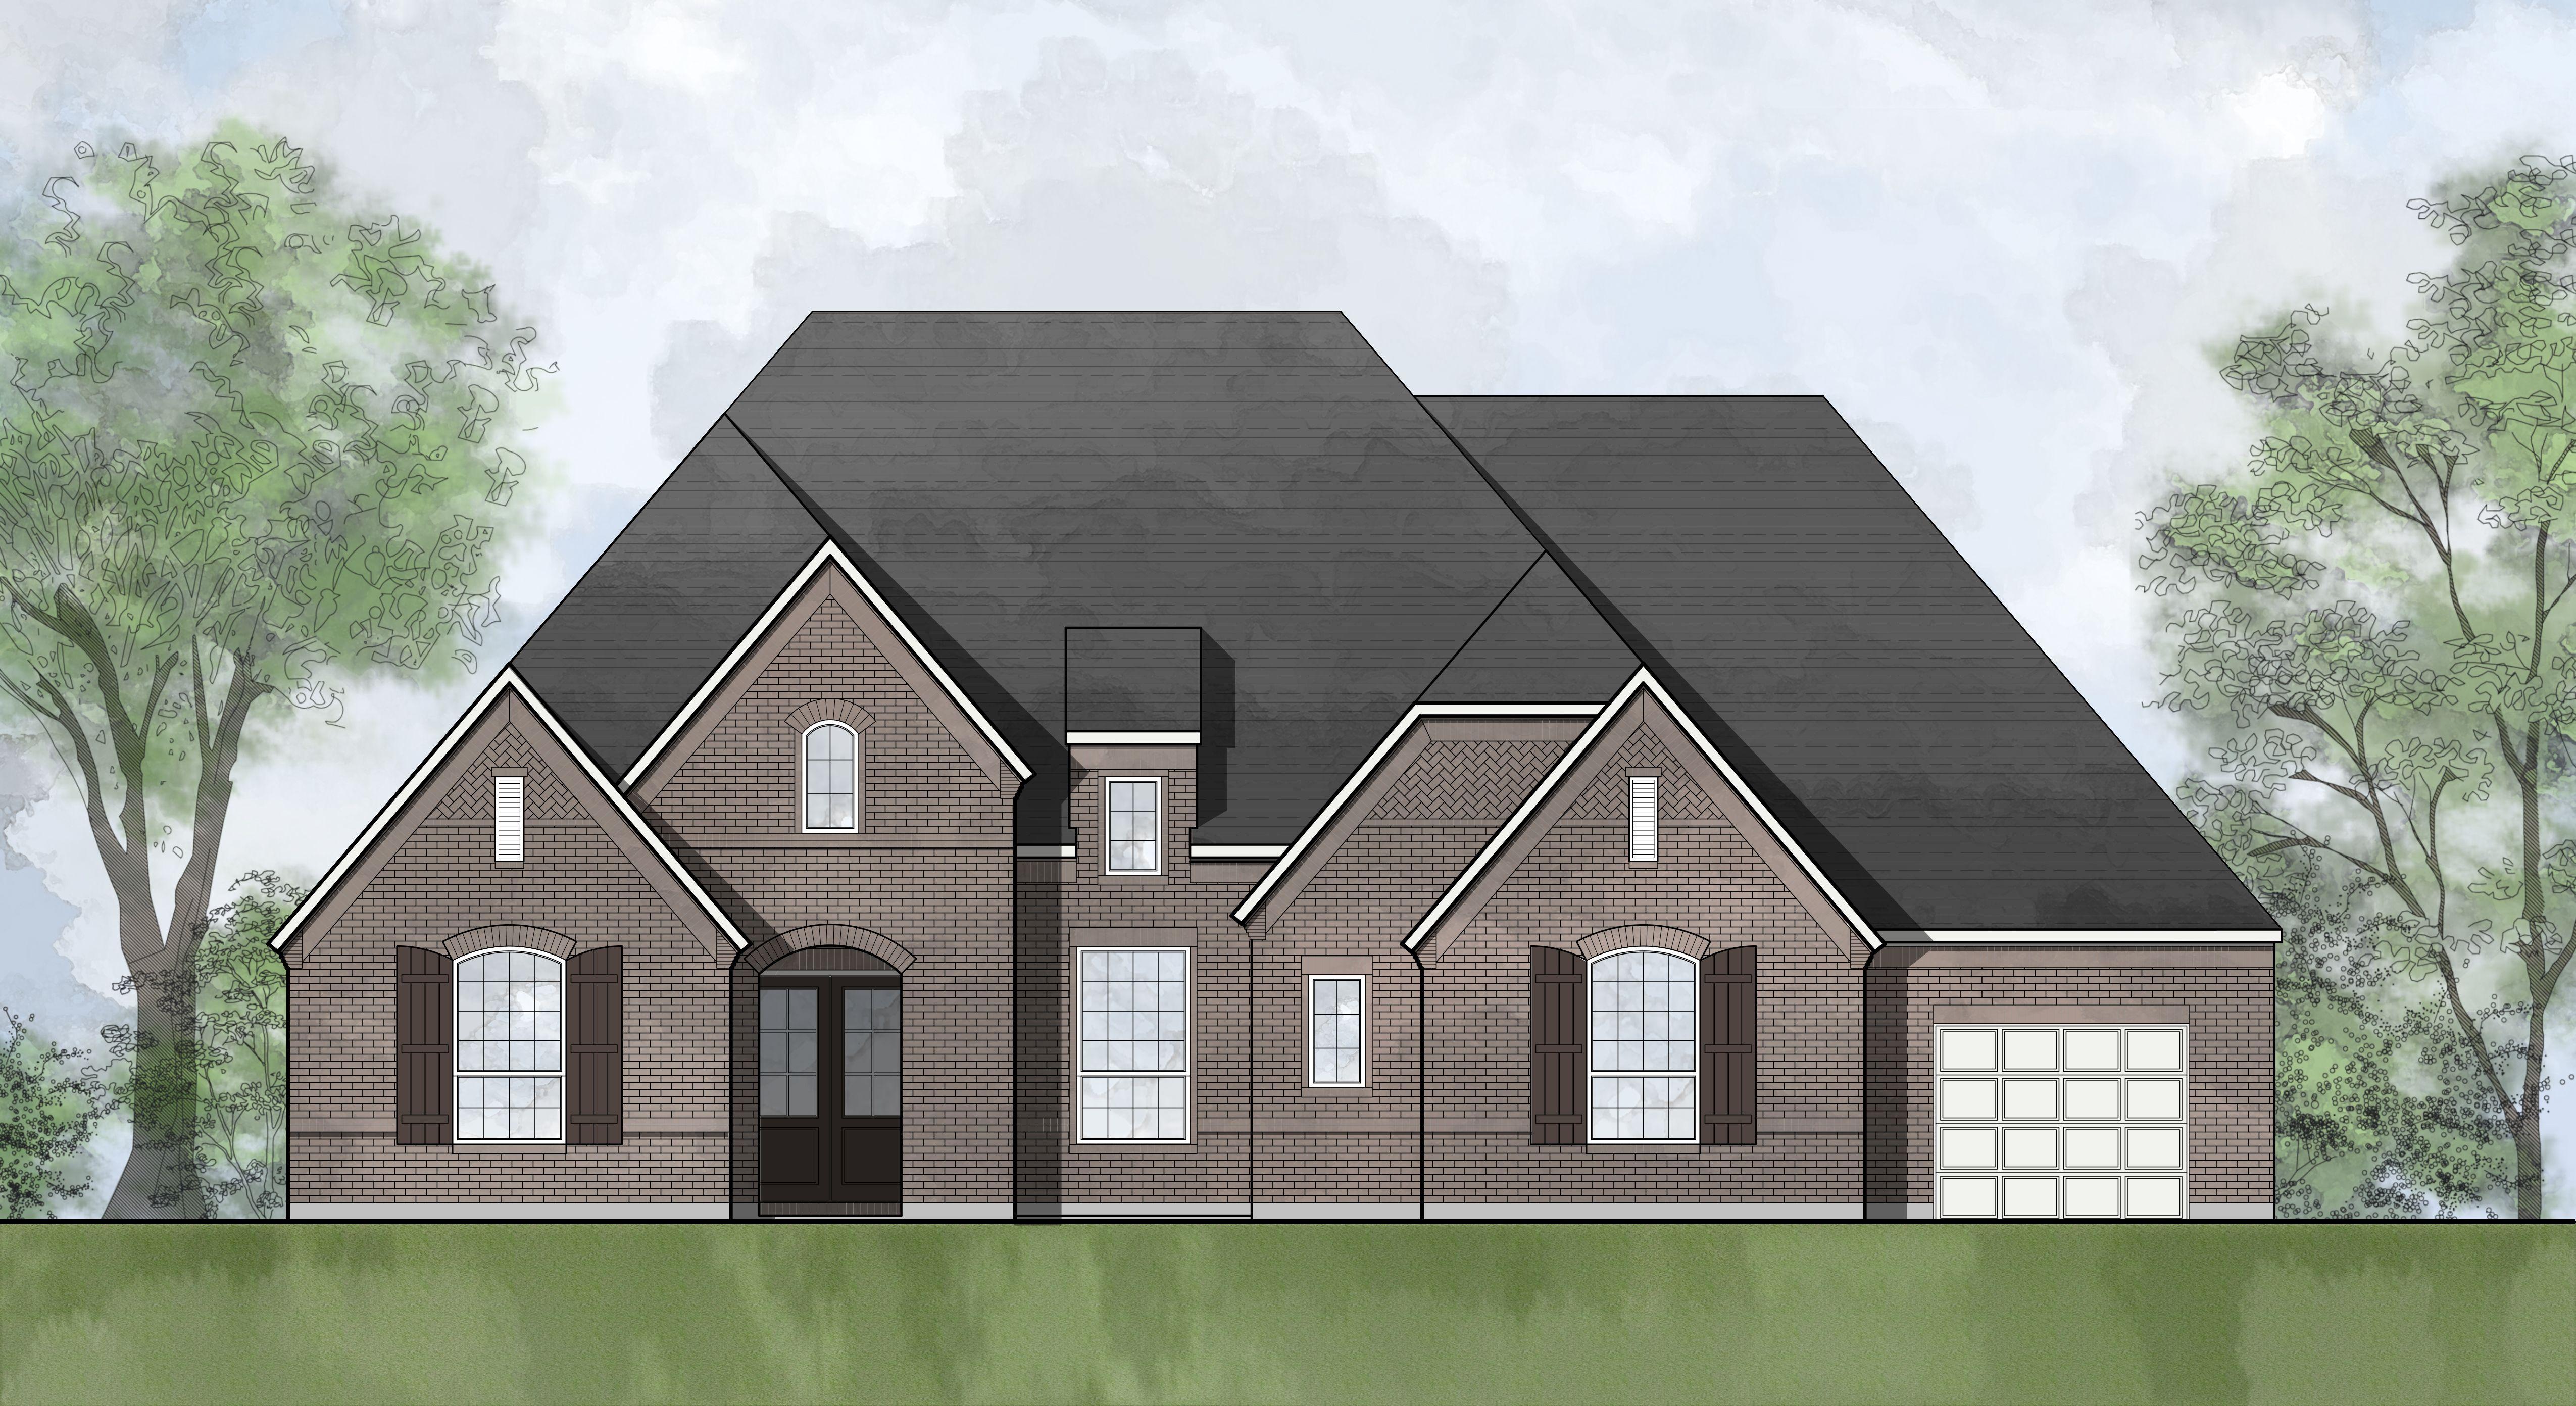 Single Family for Active at Woodtrace - Elmsley 33923 Redwood Park Pinehurst, Texas 77362 United States